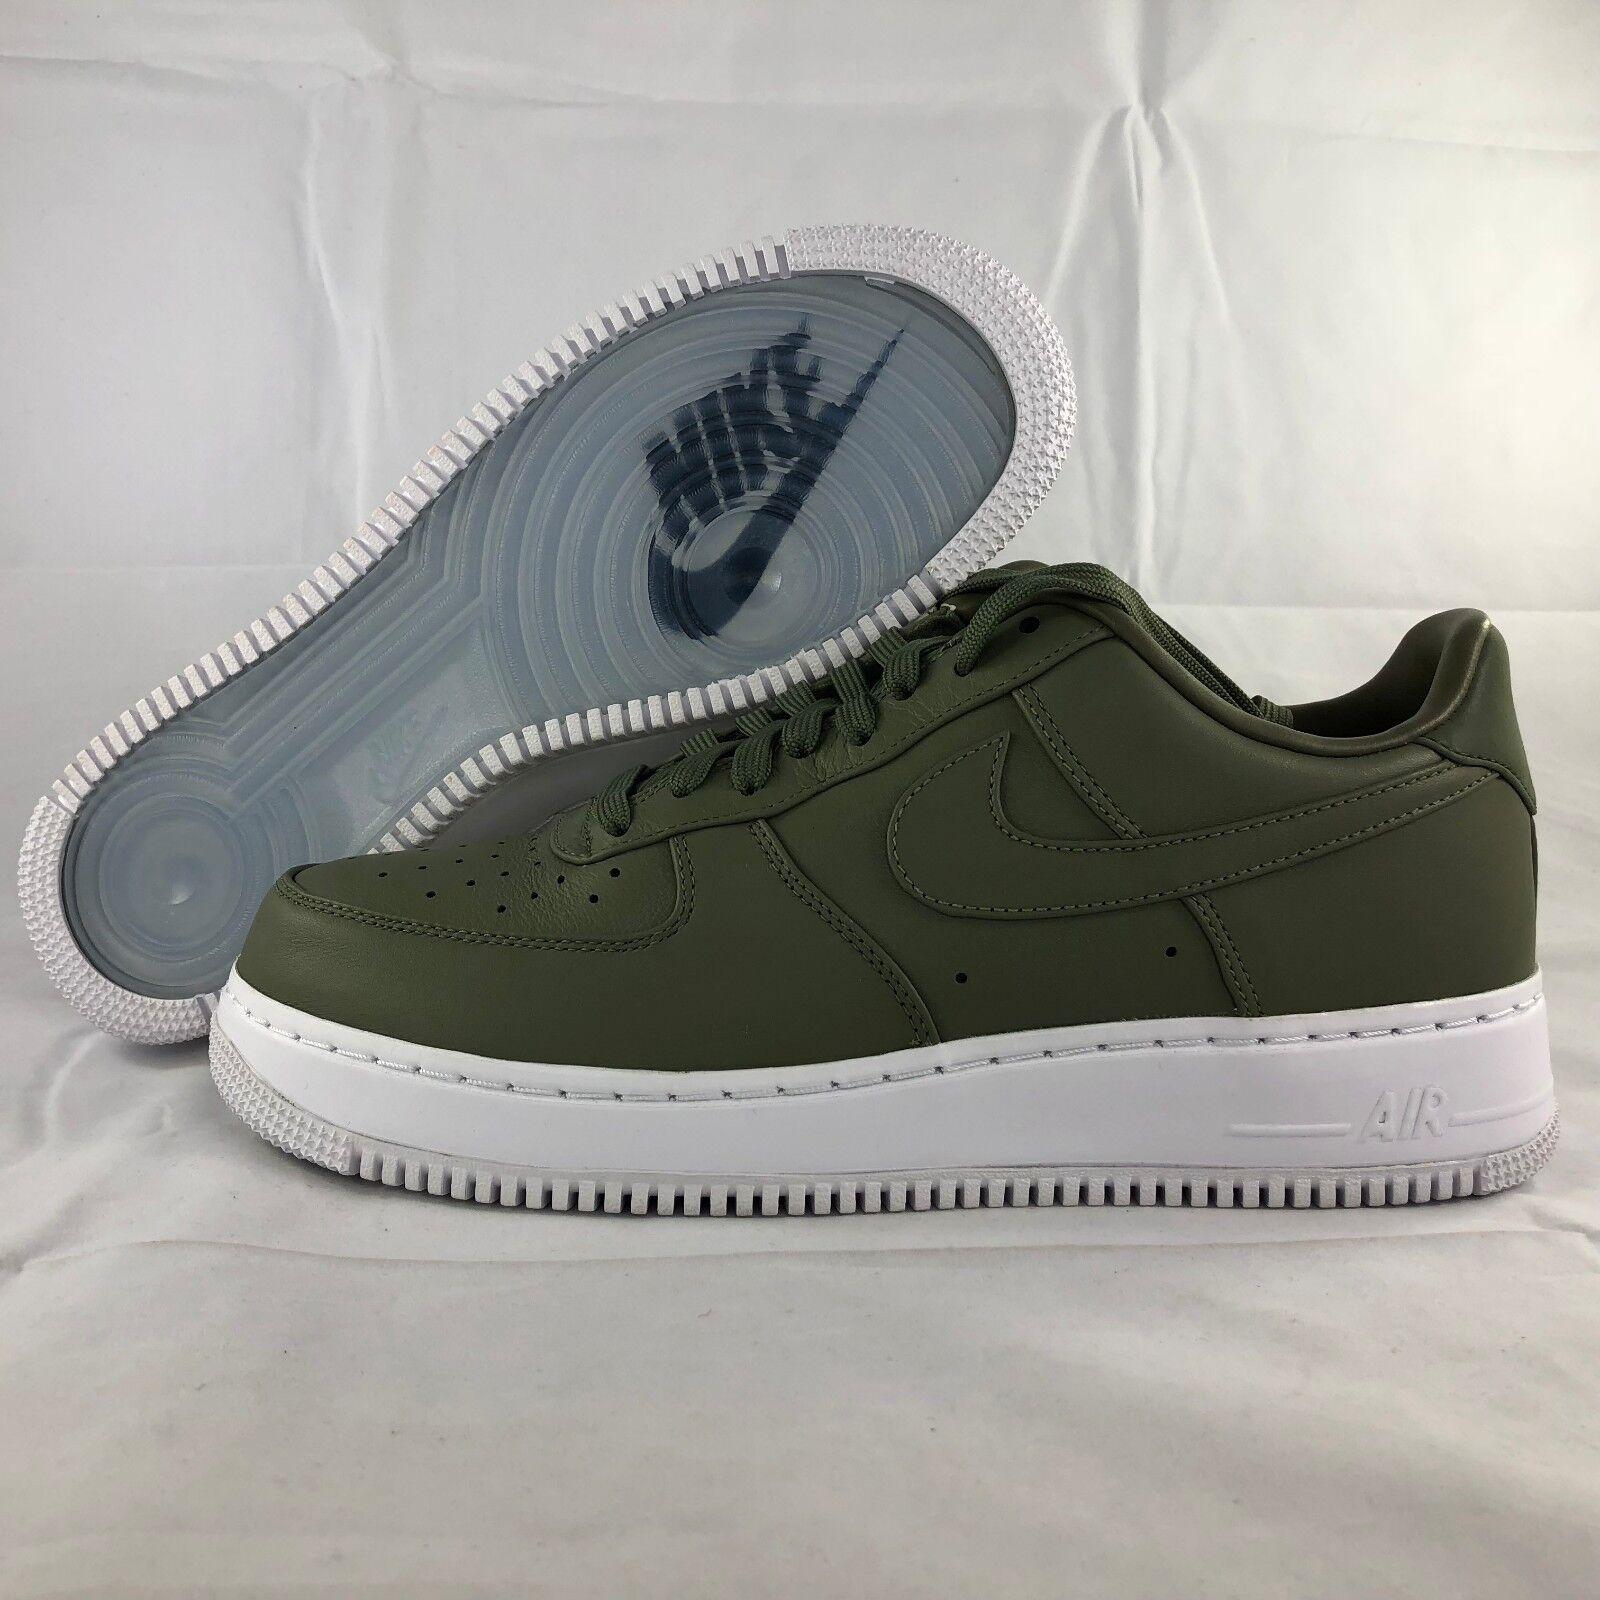 Nike NikeLab Air Force 1 Low Urban Haze Green White 555106-300 Men's 9.5-11 NEW Seasonal price cuts, discount benefits